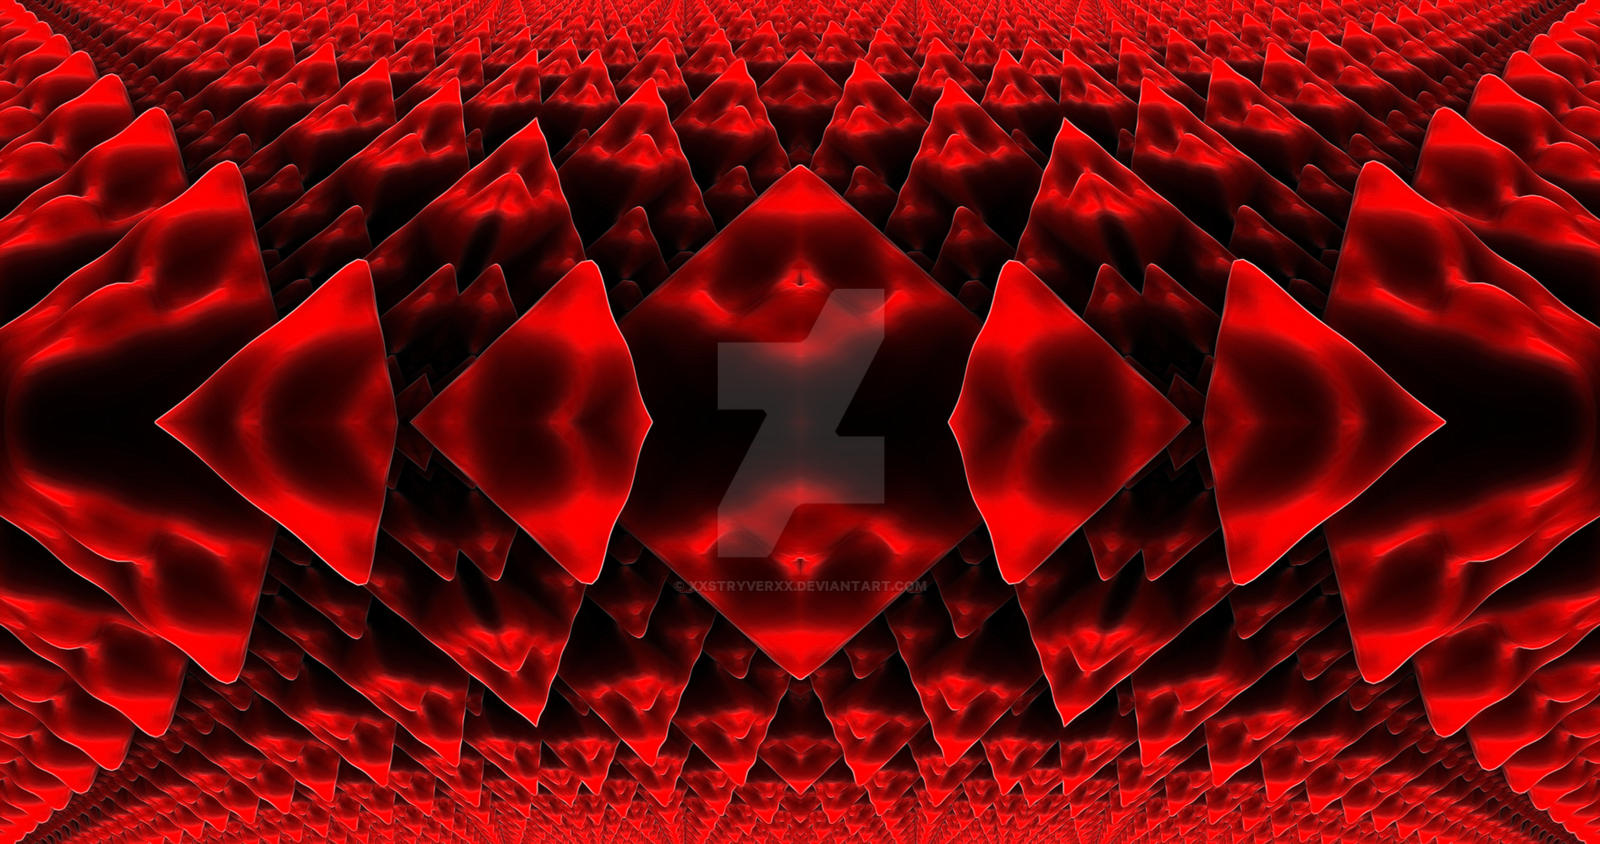 REDscales 4K Wallpaper by XxStryveRxX